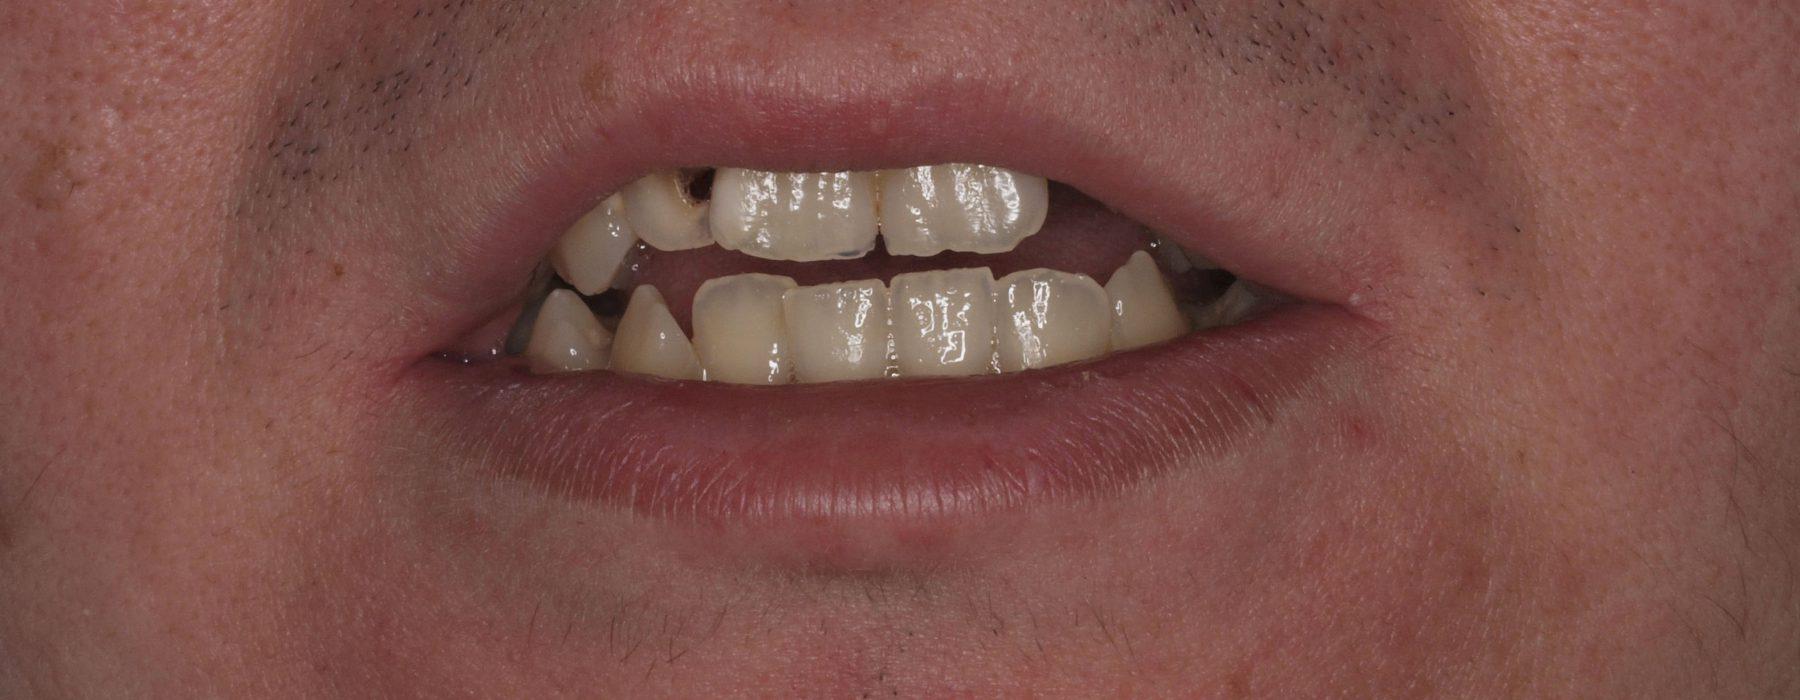 Complex dental cases